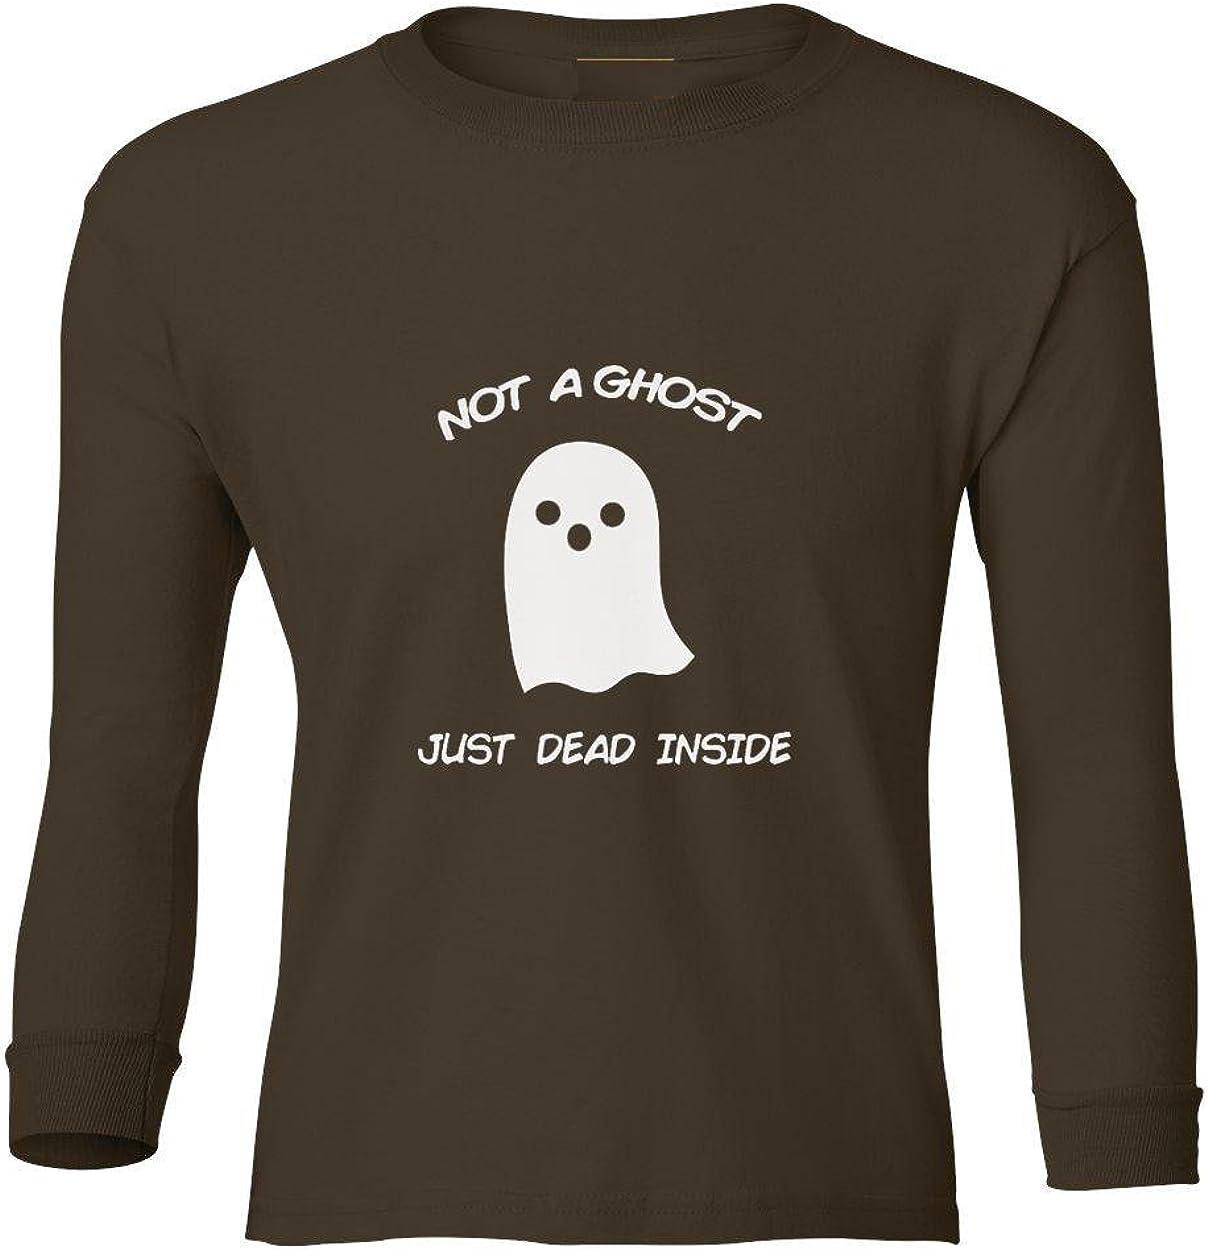 Marky G apparel Boys Not A Ghost Just Dead Inside T-Shirt